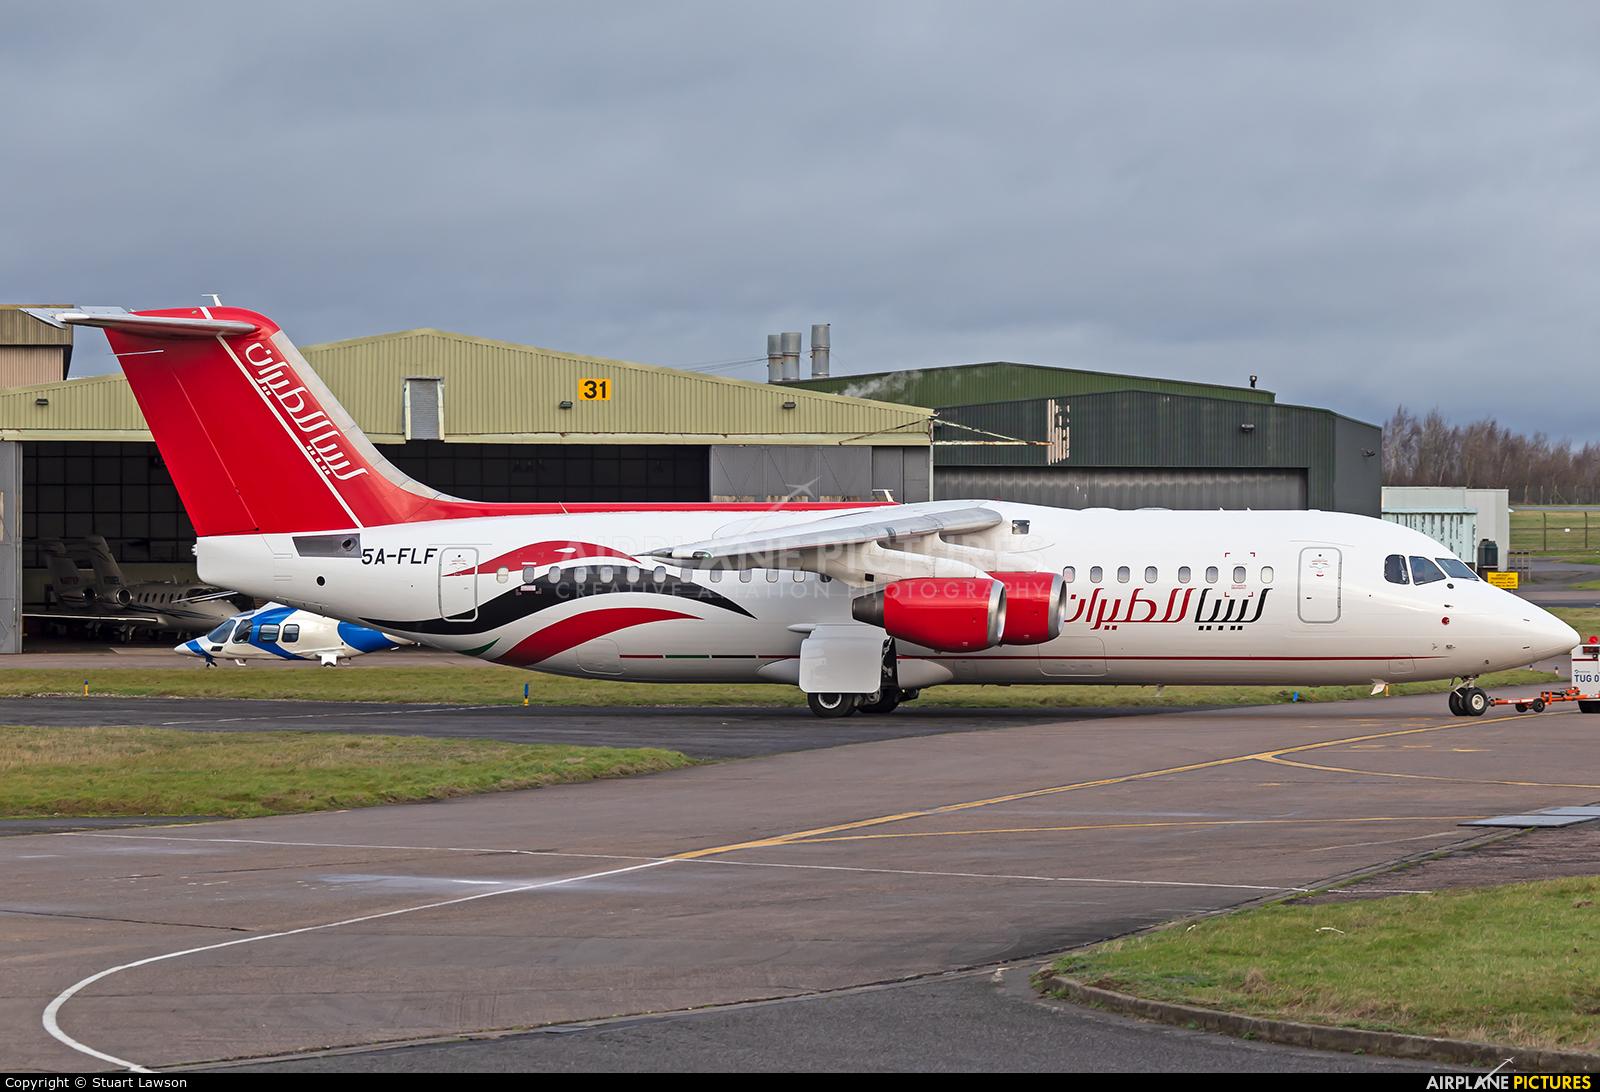 Air Libya 5A-FLF aircraft at East Midlands